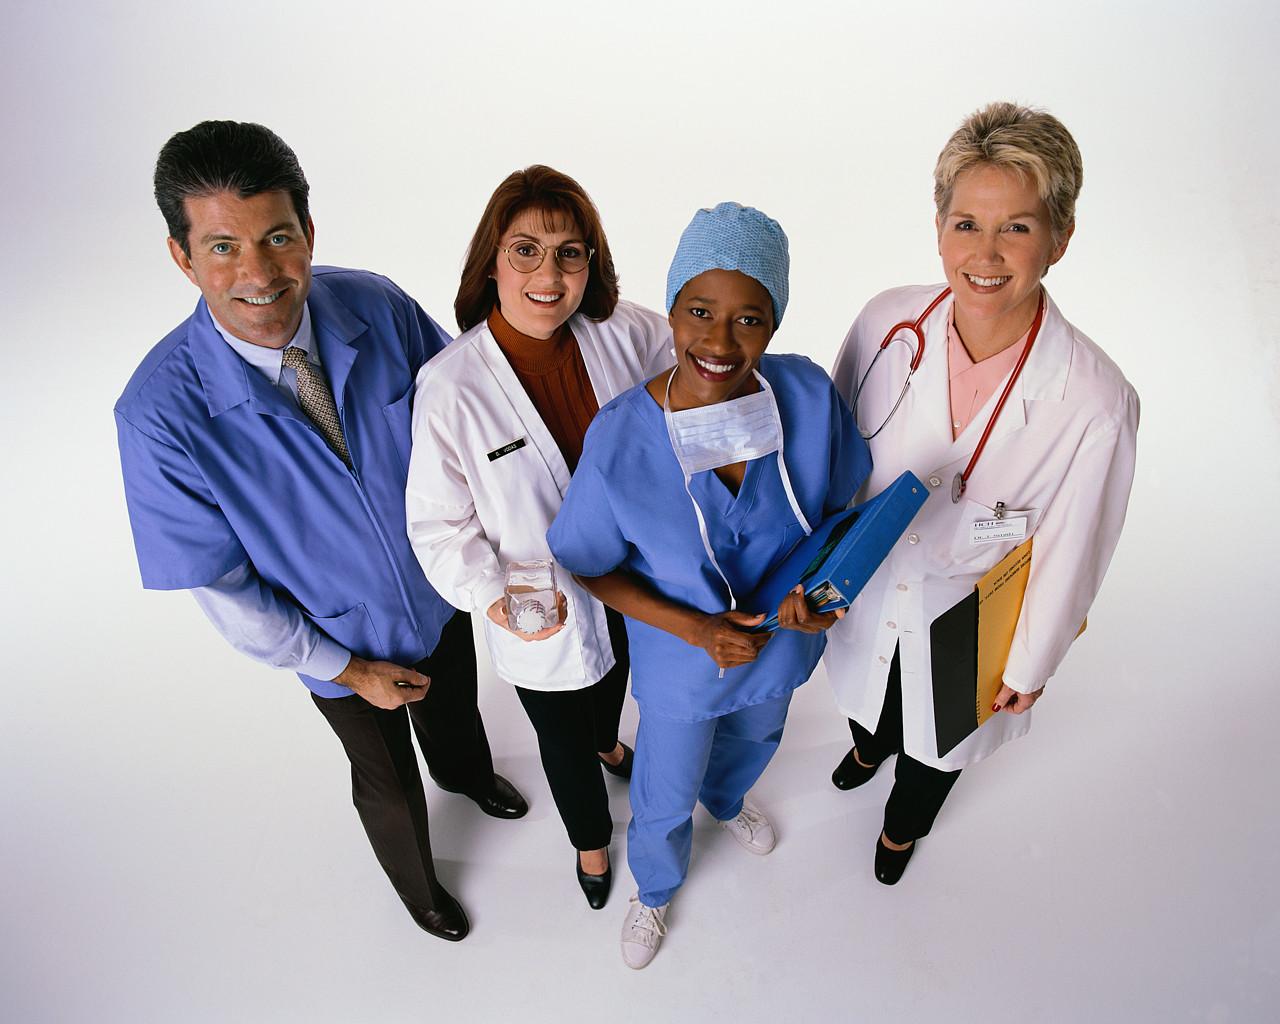 Decorative image of health professionals